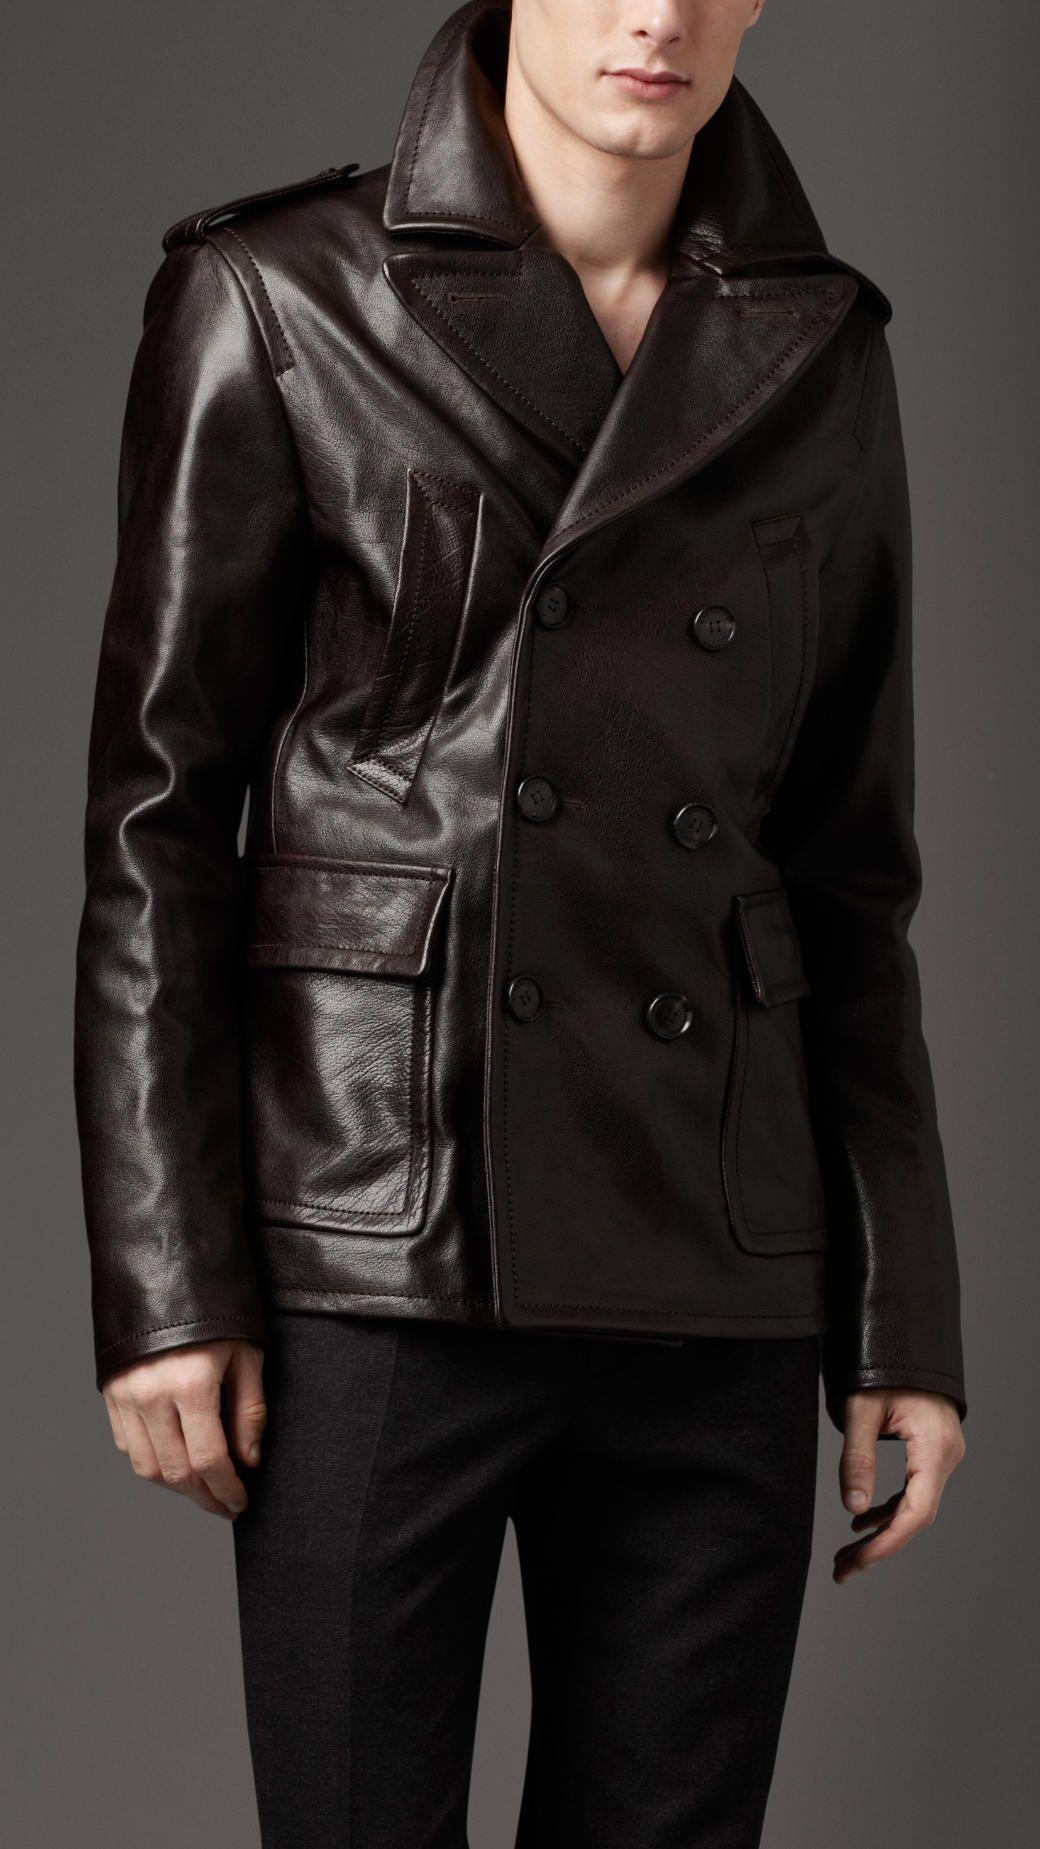 Burberry Dark Leather Pea Coat White Leather Jacket Outfit Winter White Leather Jacket Outfit Leather Jacket Men [ 1849 x 1040 Pixel ]